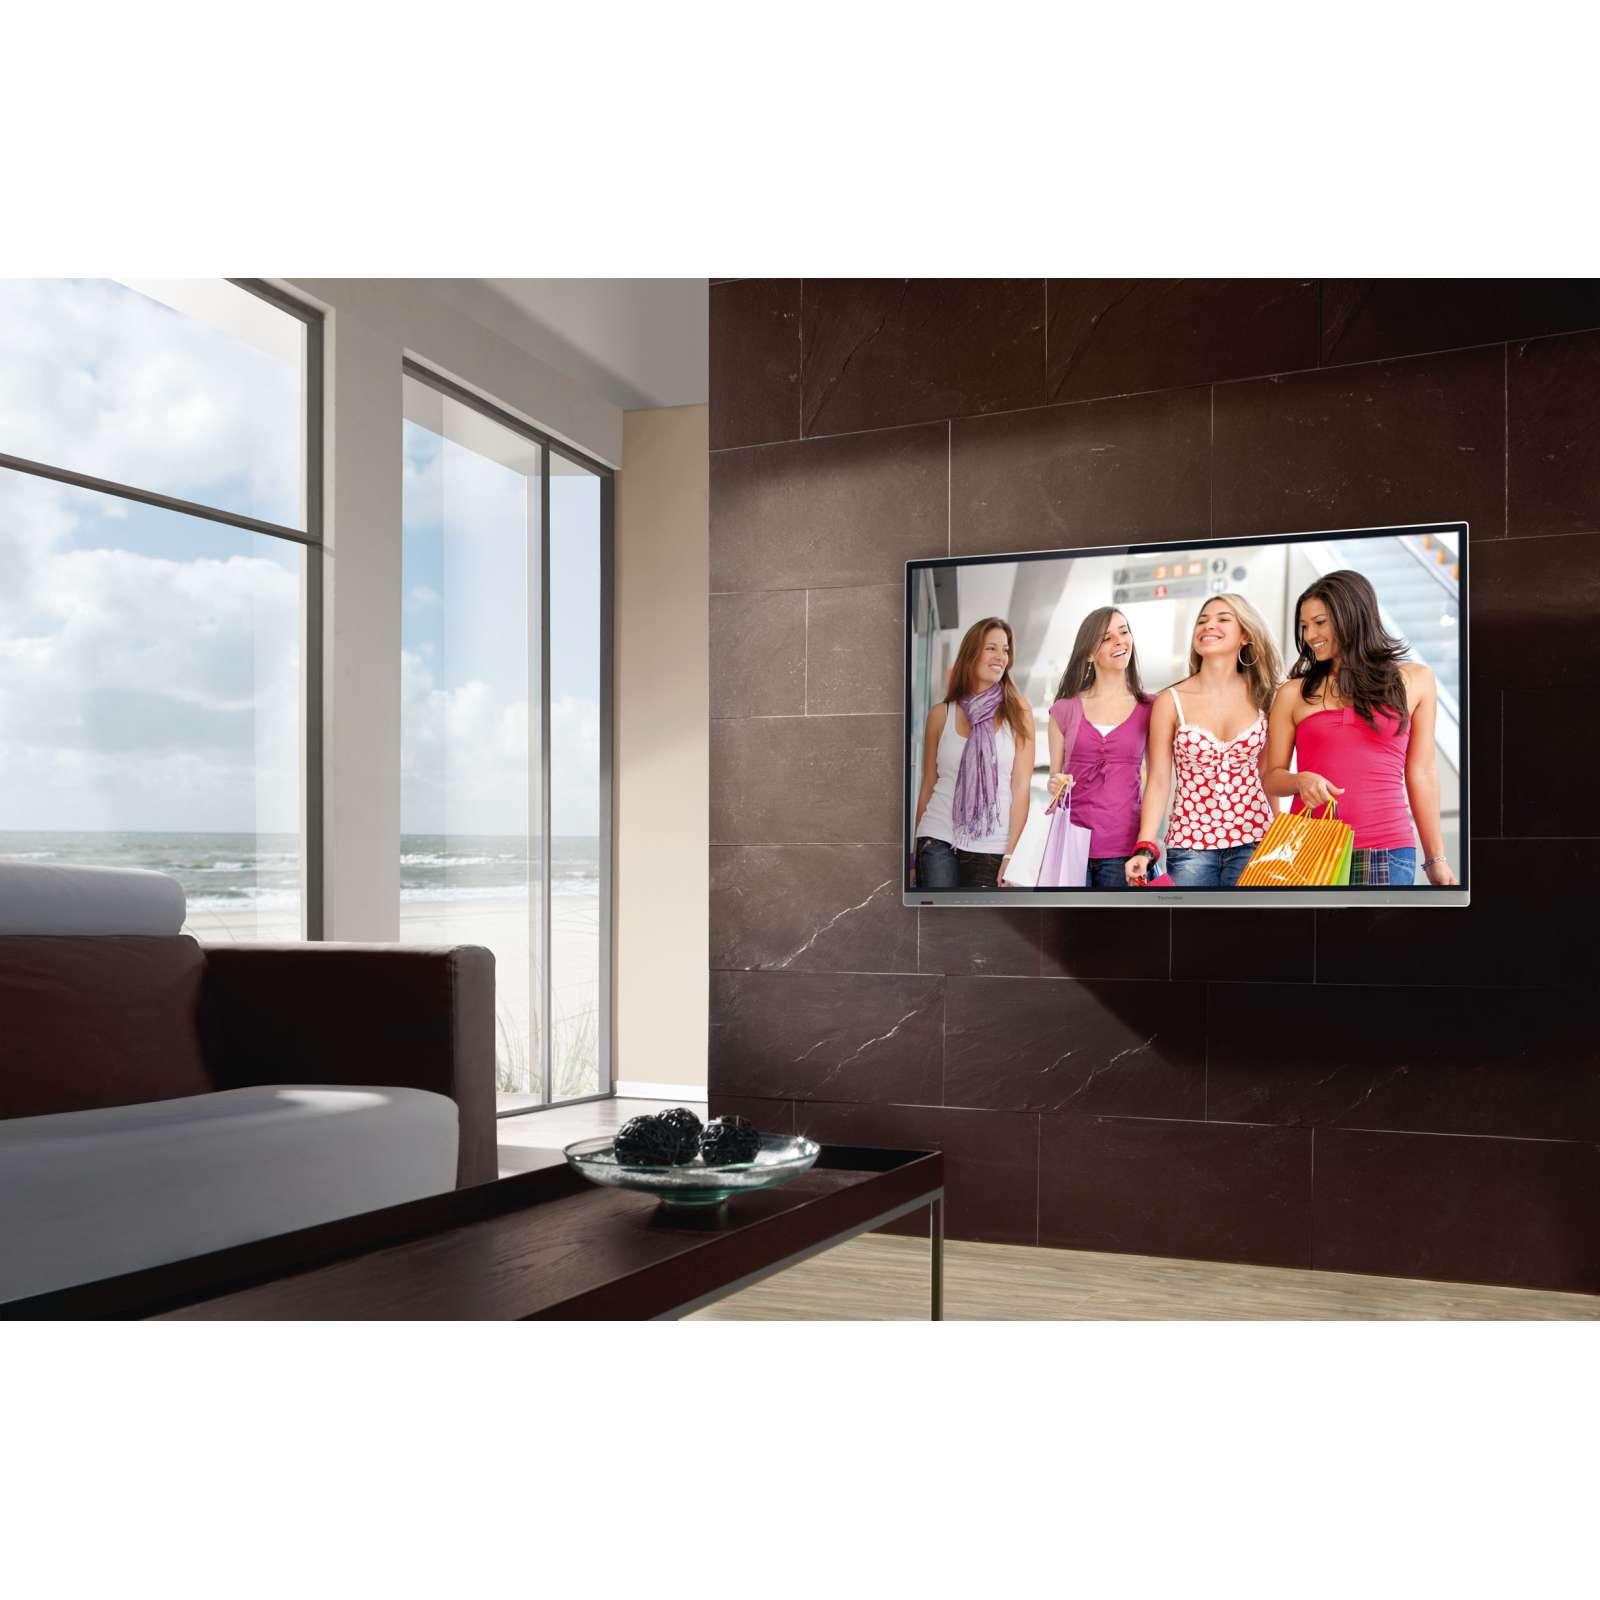 47 zoll technisat tv led fernseher elektro risch. Black Bedroom Furniture Sets. Home Design Ideas